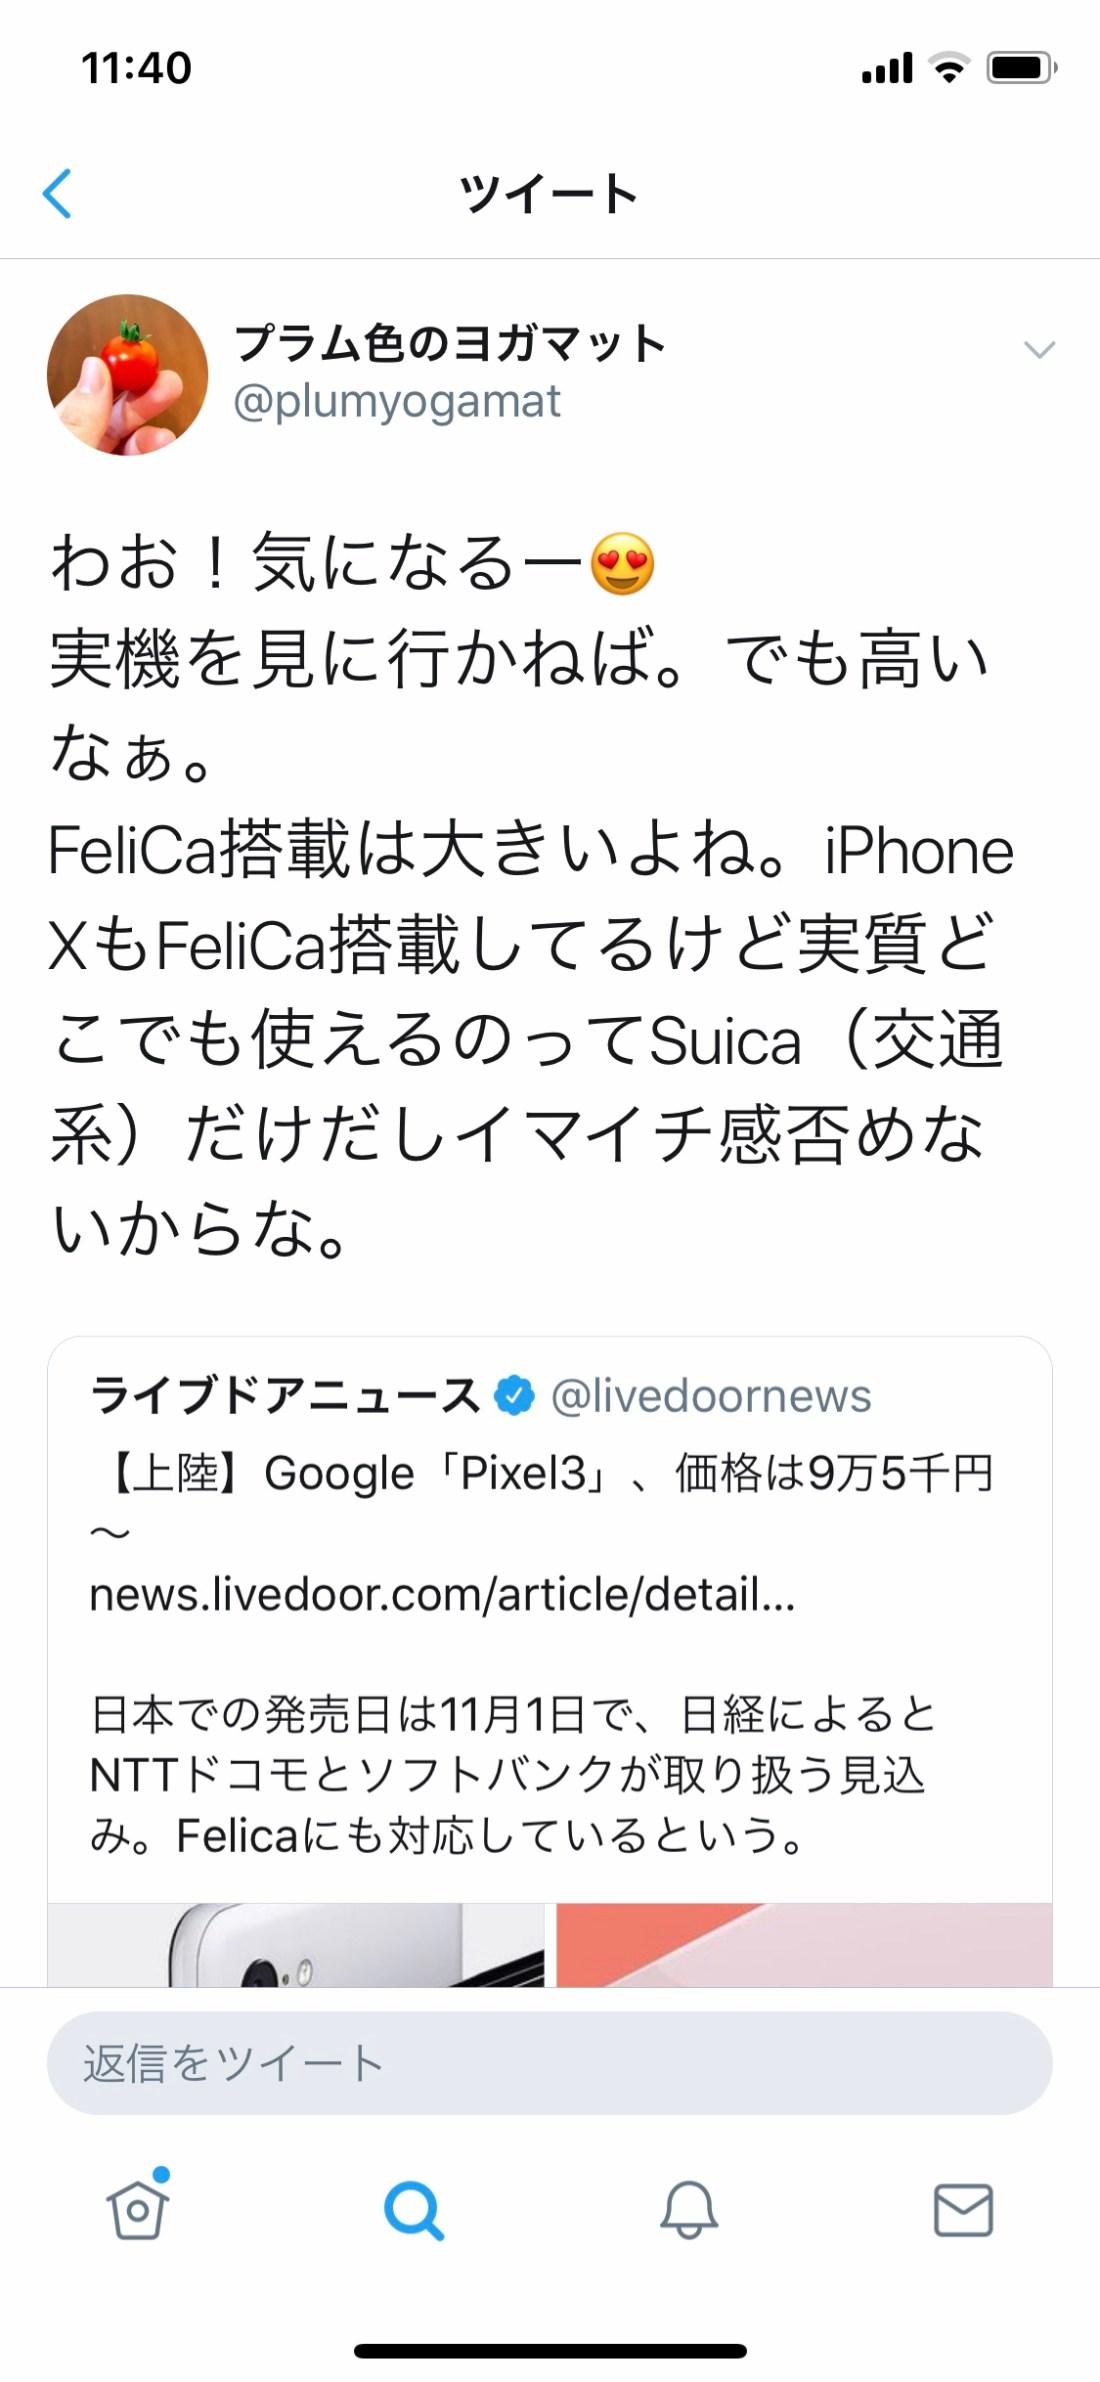 iPhone X Suica problem switcher